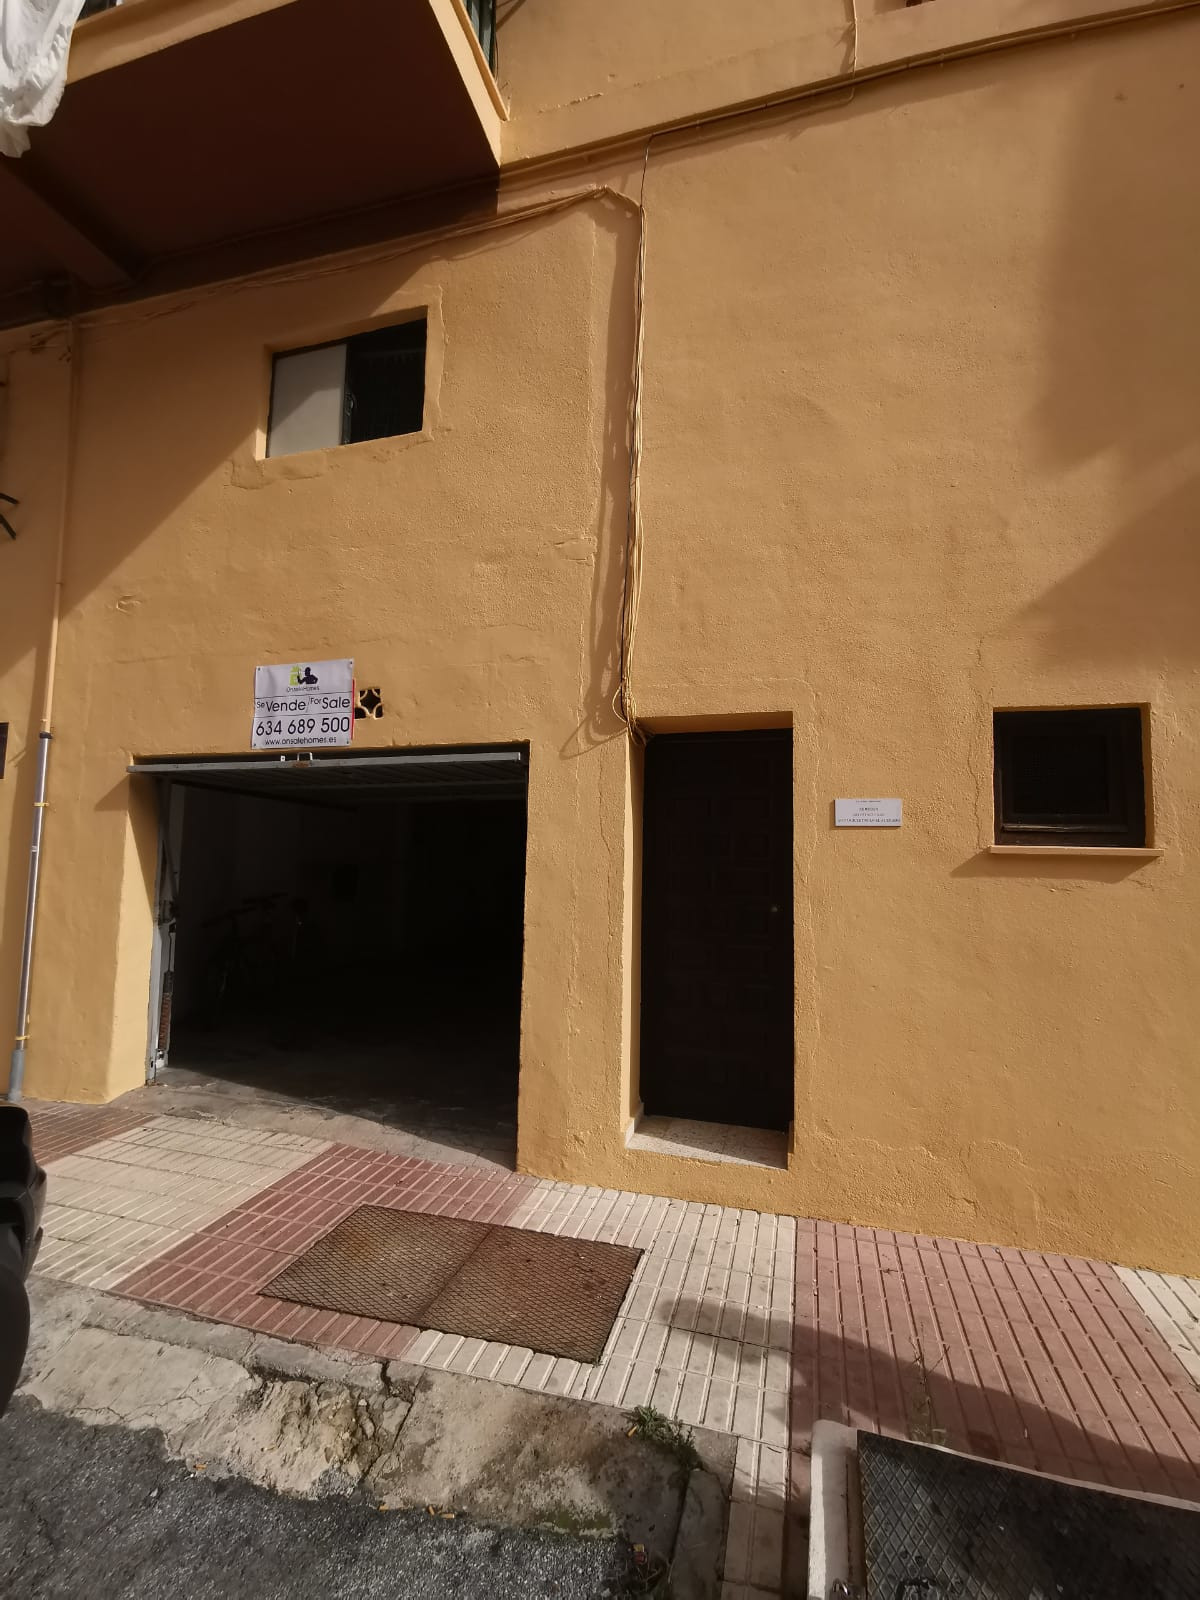 Commercial Premises for sale in Marbella R3748798